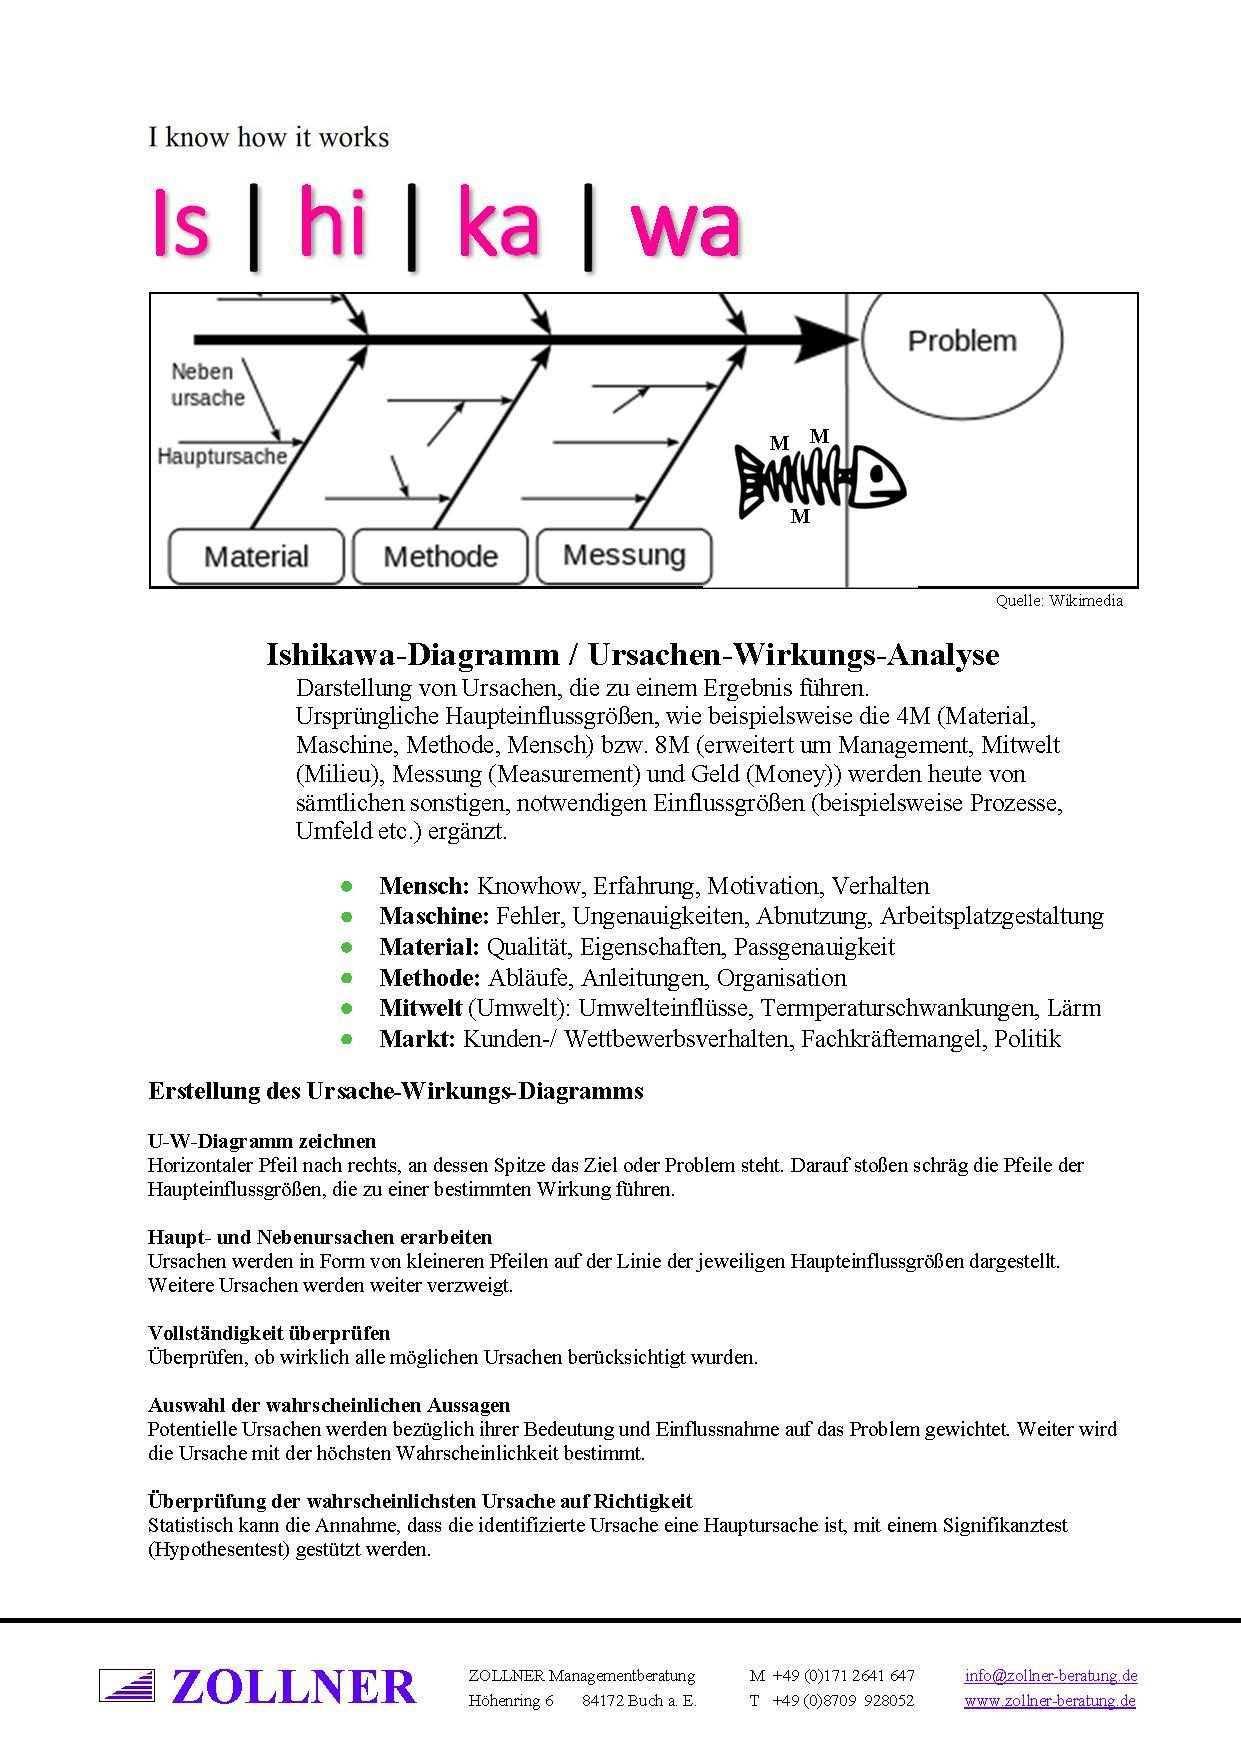 Tool Box Ishikawa Ursache Wirkung Fischgratendiagramm Wolfgang Zollner Ishikawa Lernmethoden Psychologie Lernen